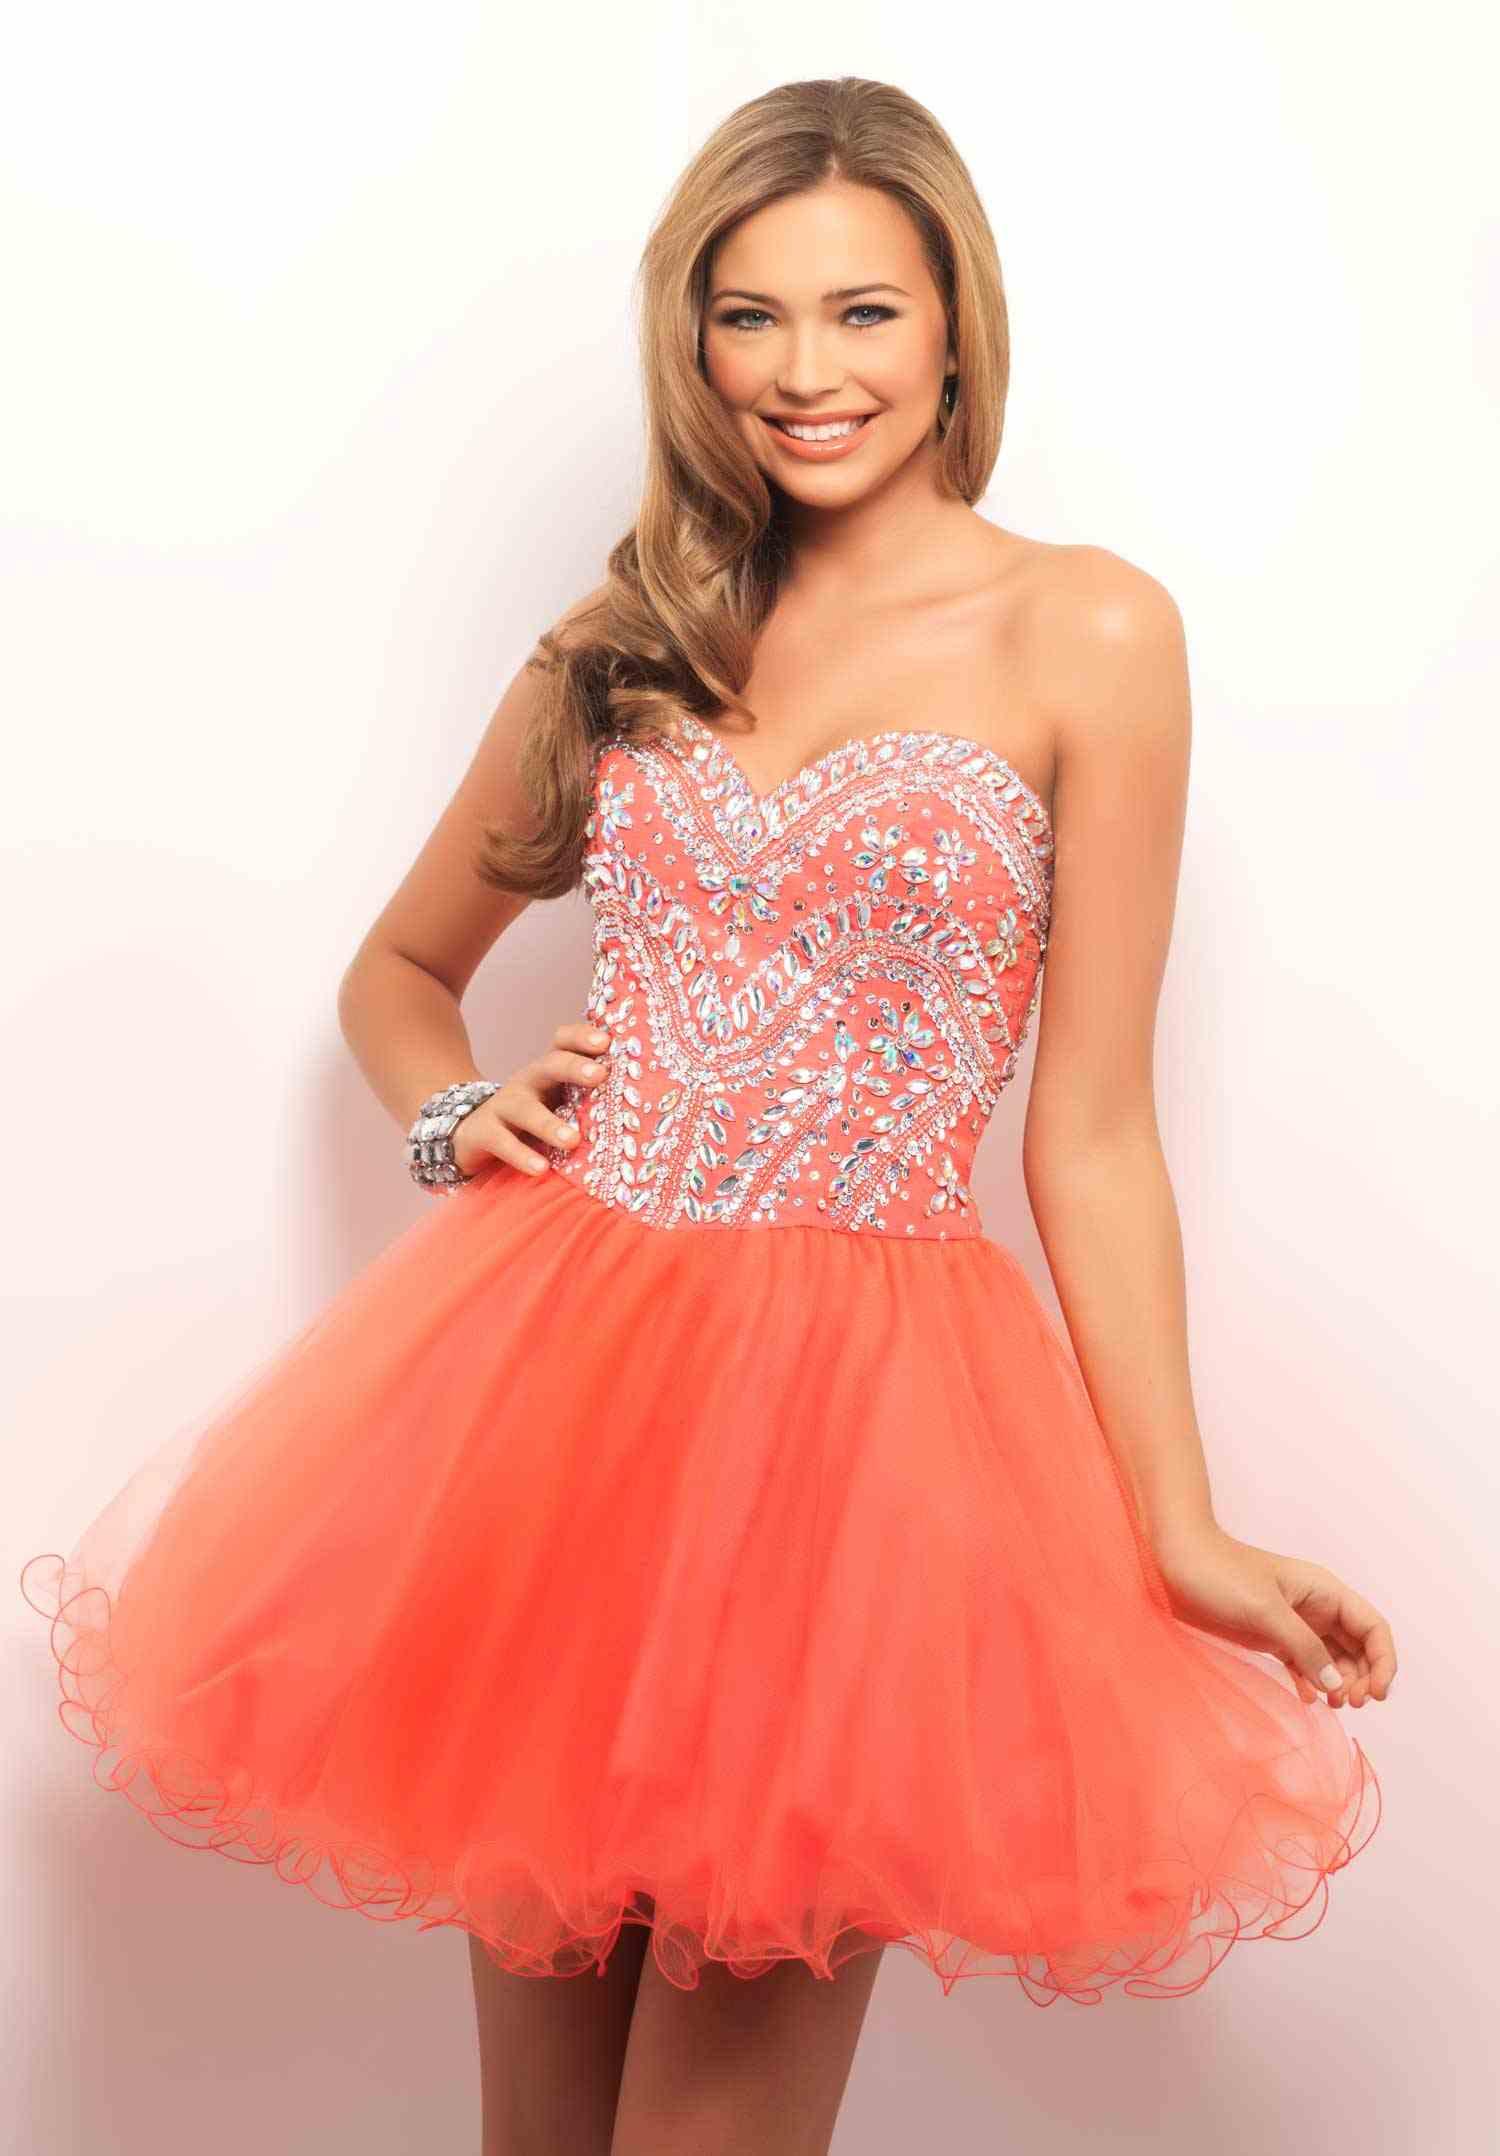 Short Coral Prom Dress Dressedupgirl Com